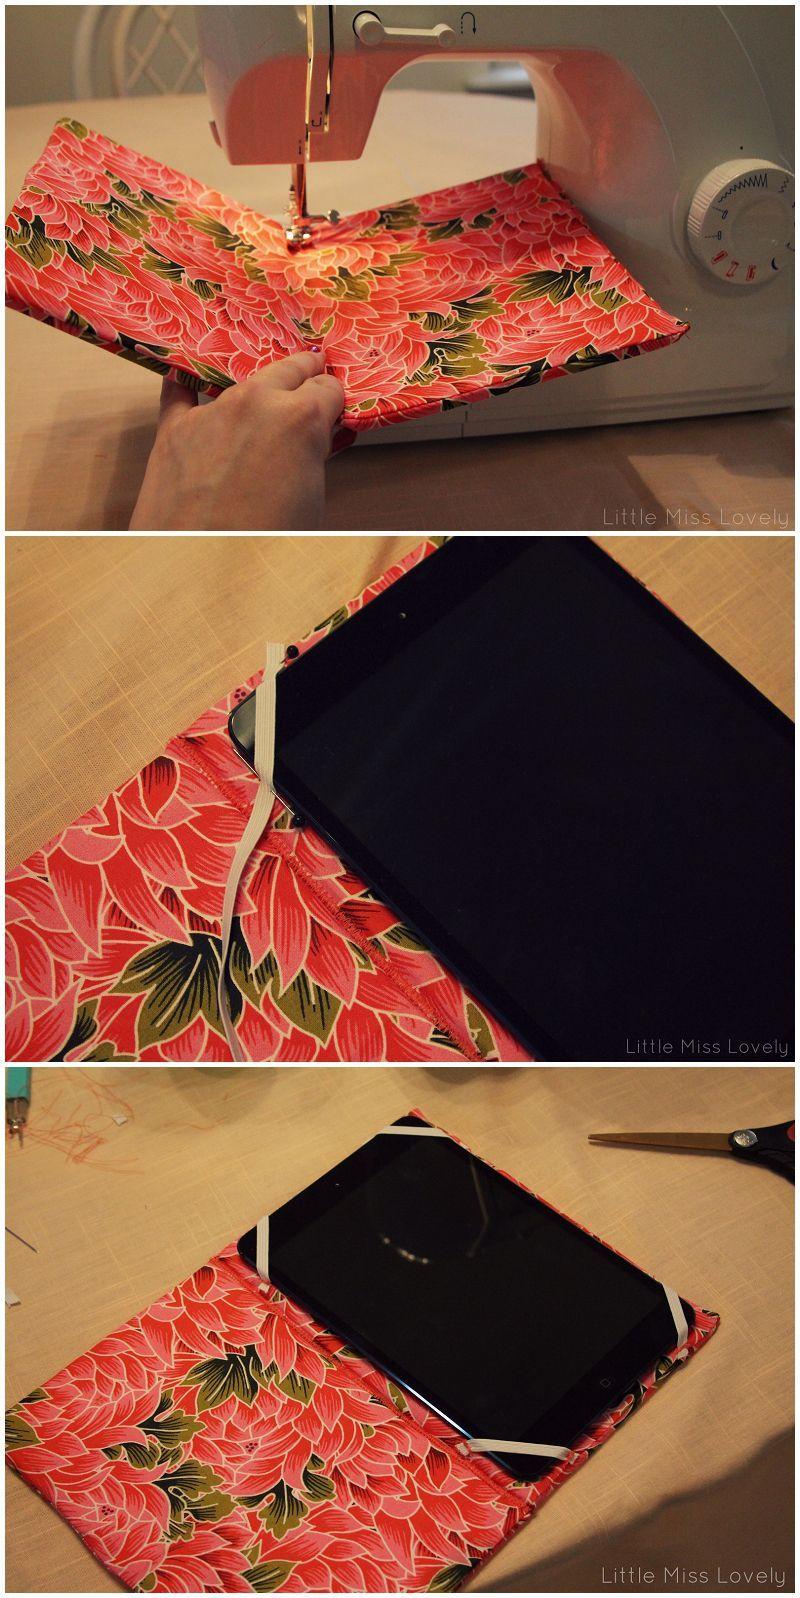 Create an iPad Case for $5 in 1 hour DIY iPad Case by Little Miss LovelyDIY iPad Case by Little Miss Lovely